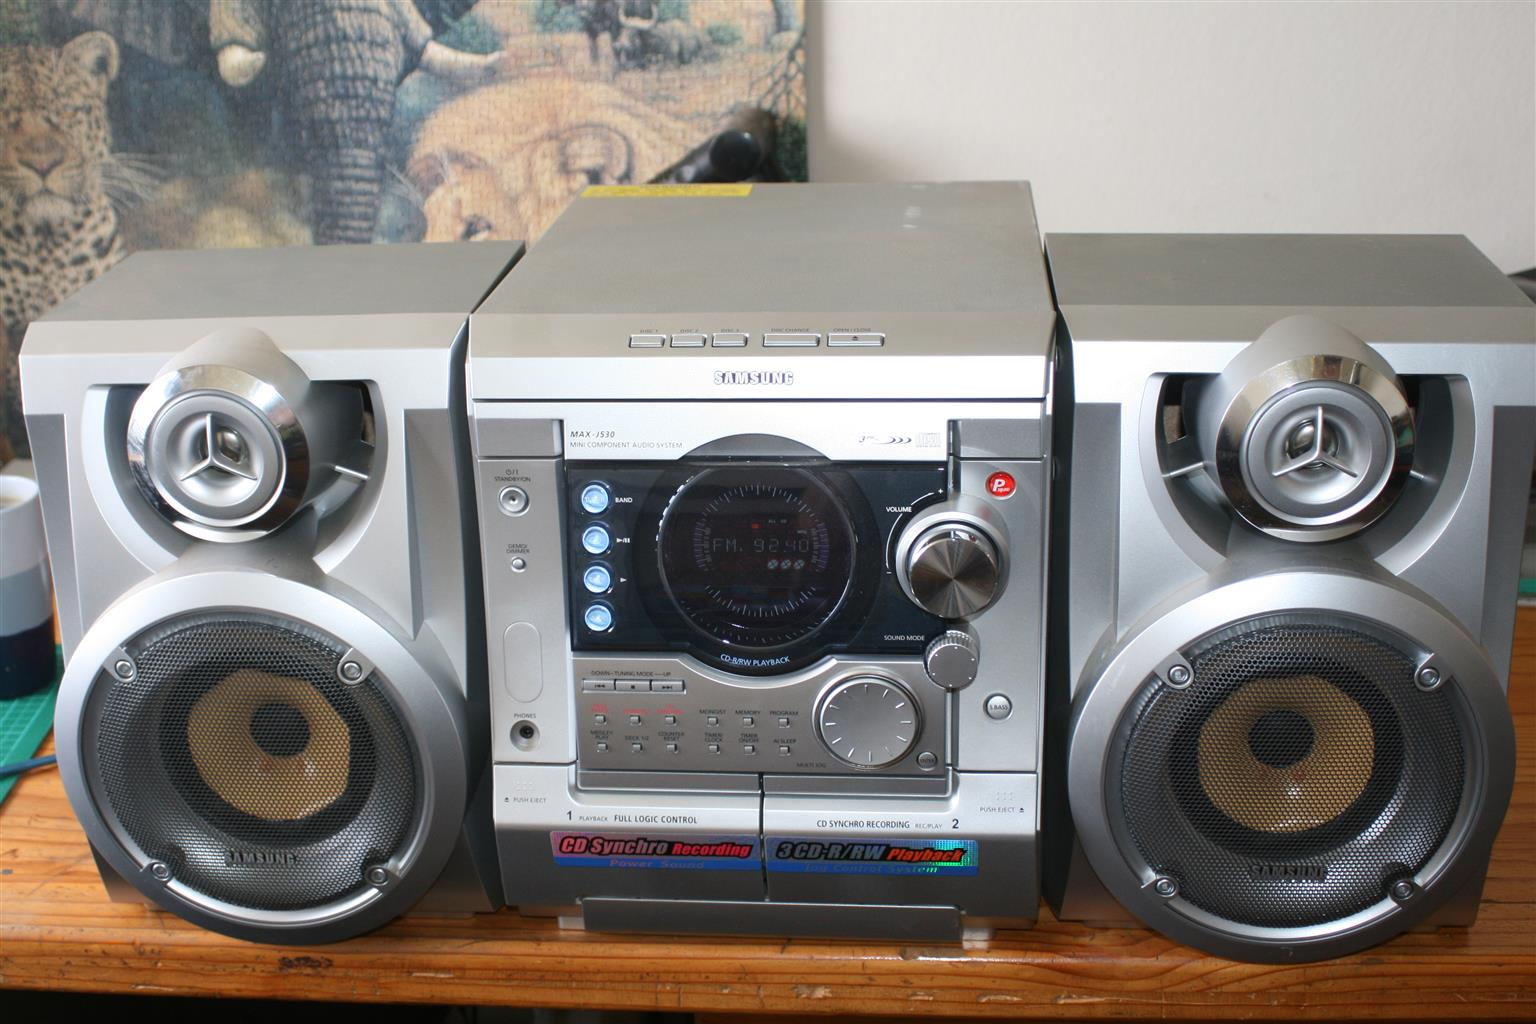 Mini Hi-Fi.  Samsung Max J530 - PMPO 600 watt.  3 CD Shaffle 2 Casette.  As NEW!